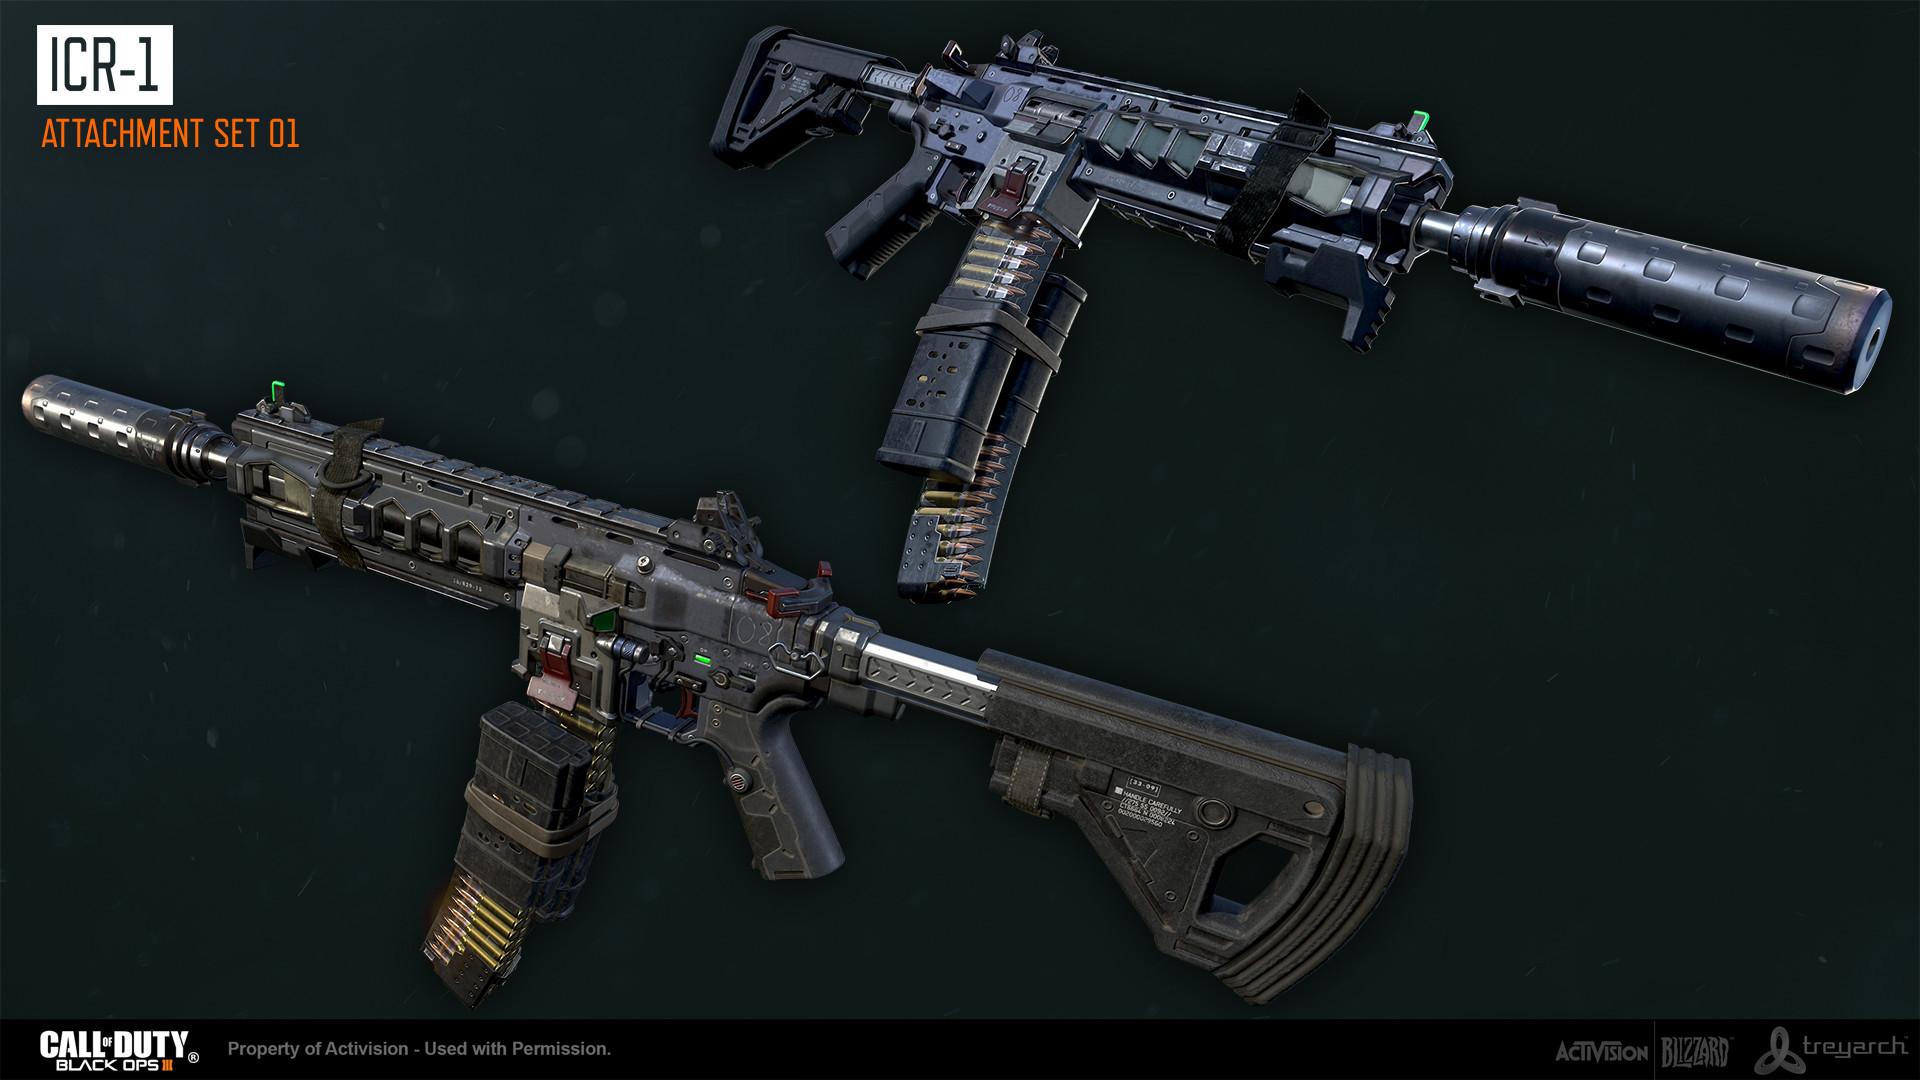 ArtStation - Black Ops 3: ICR-1 Assault Rifle, Ethan Hiley